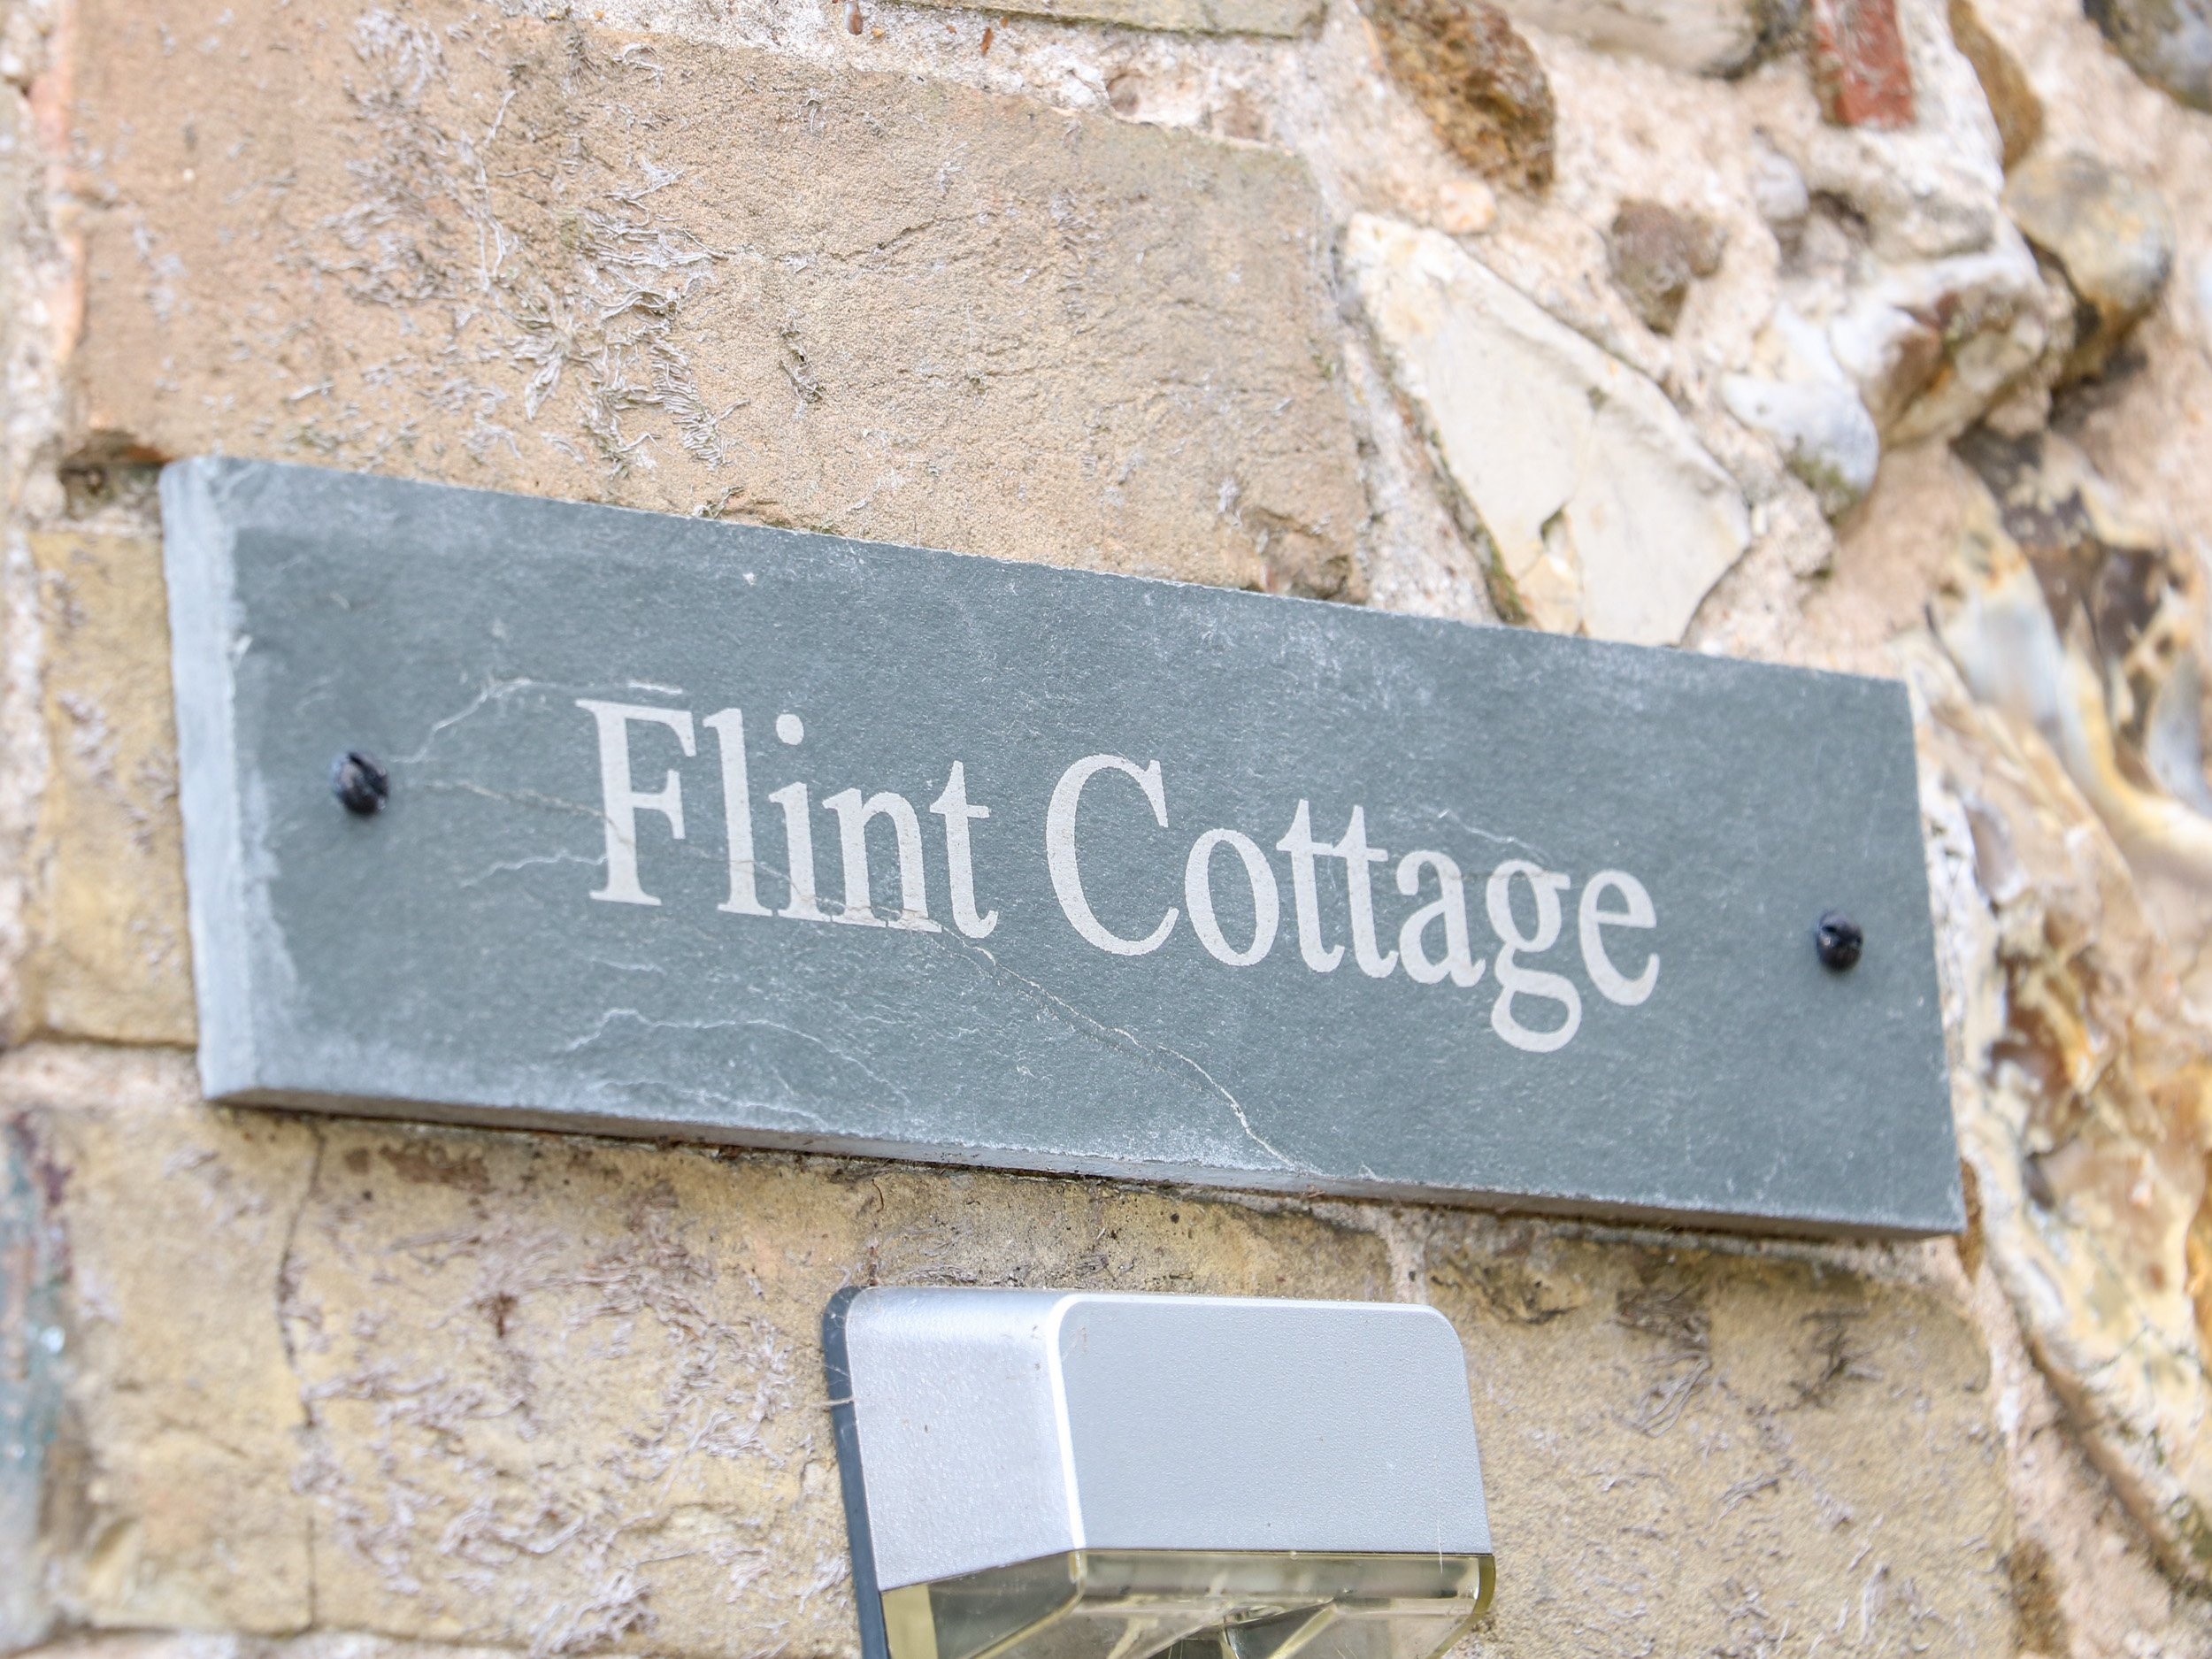 Photo of Flint Cottage